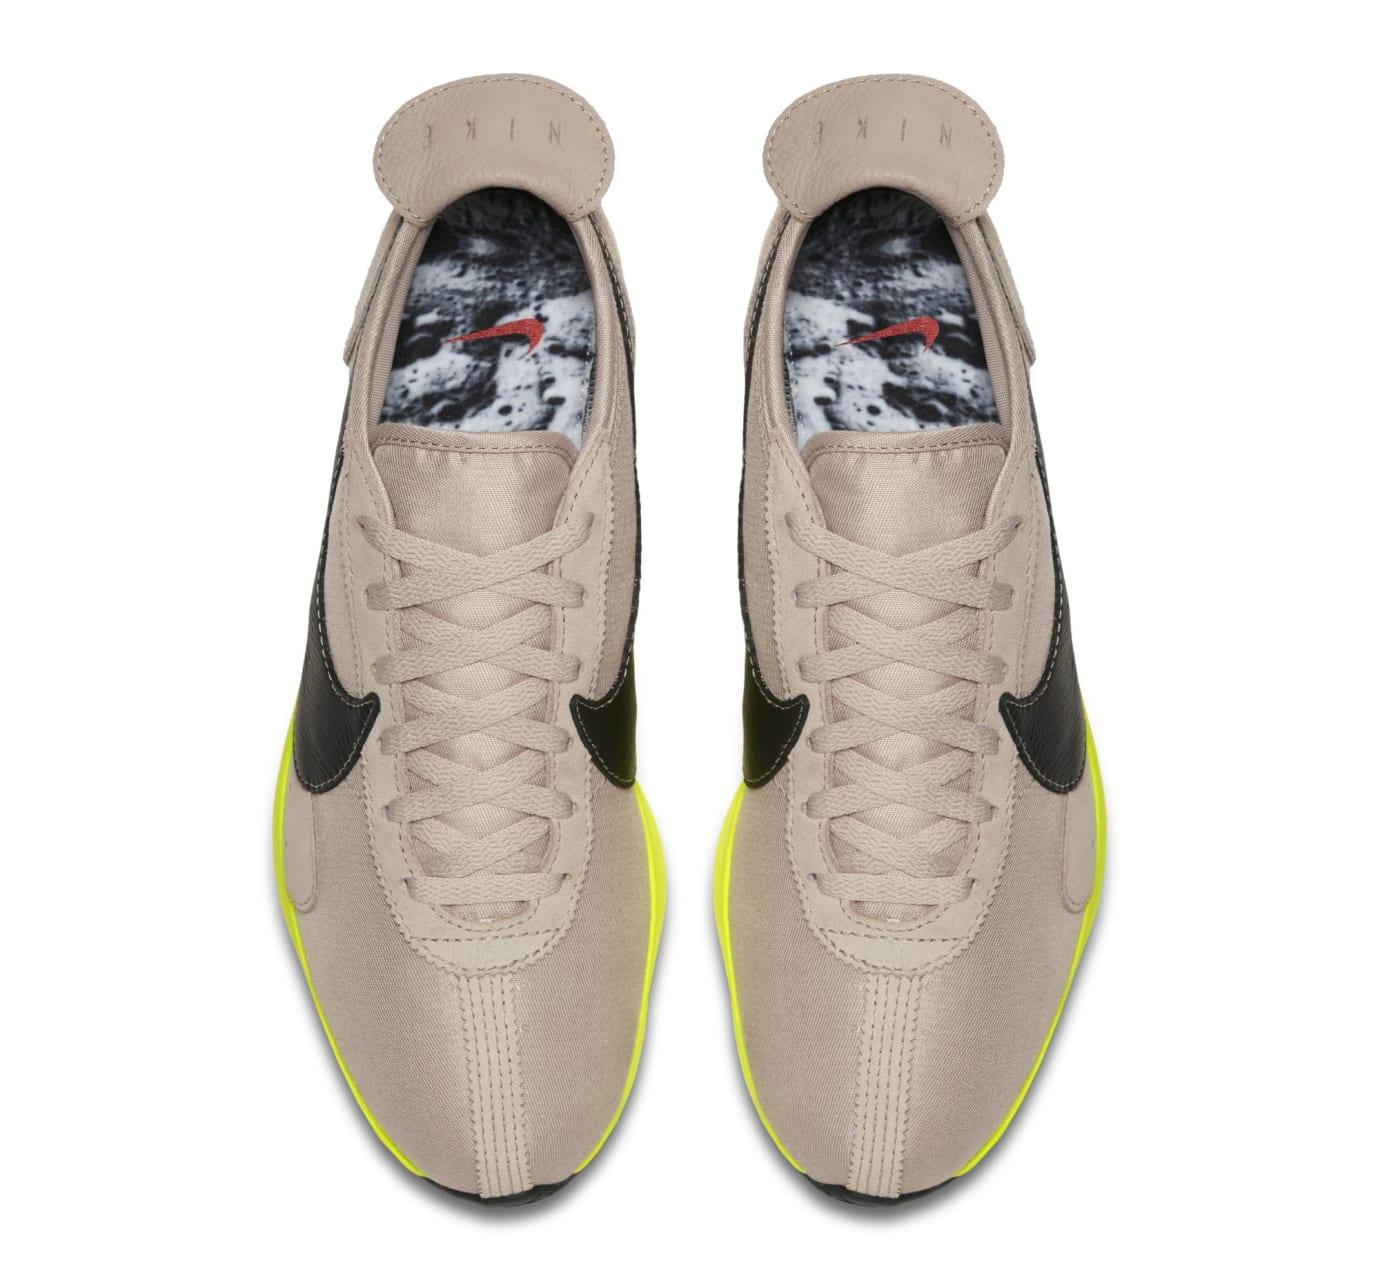 Image via Nike Nike Moon Racer  Black Sail Volt  AQ4121-200 (Top) 3912430a8